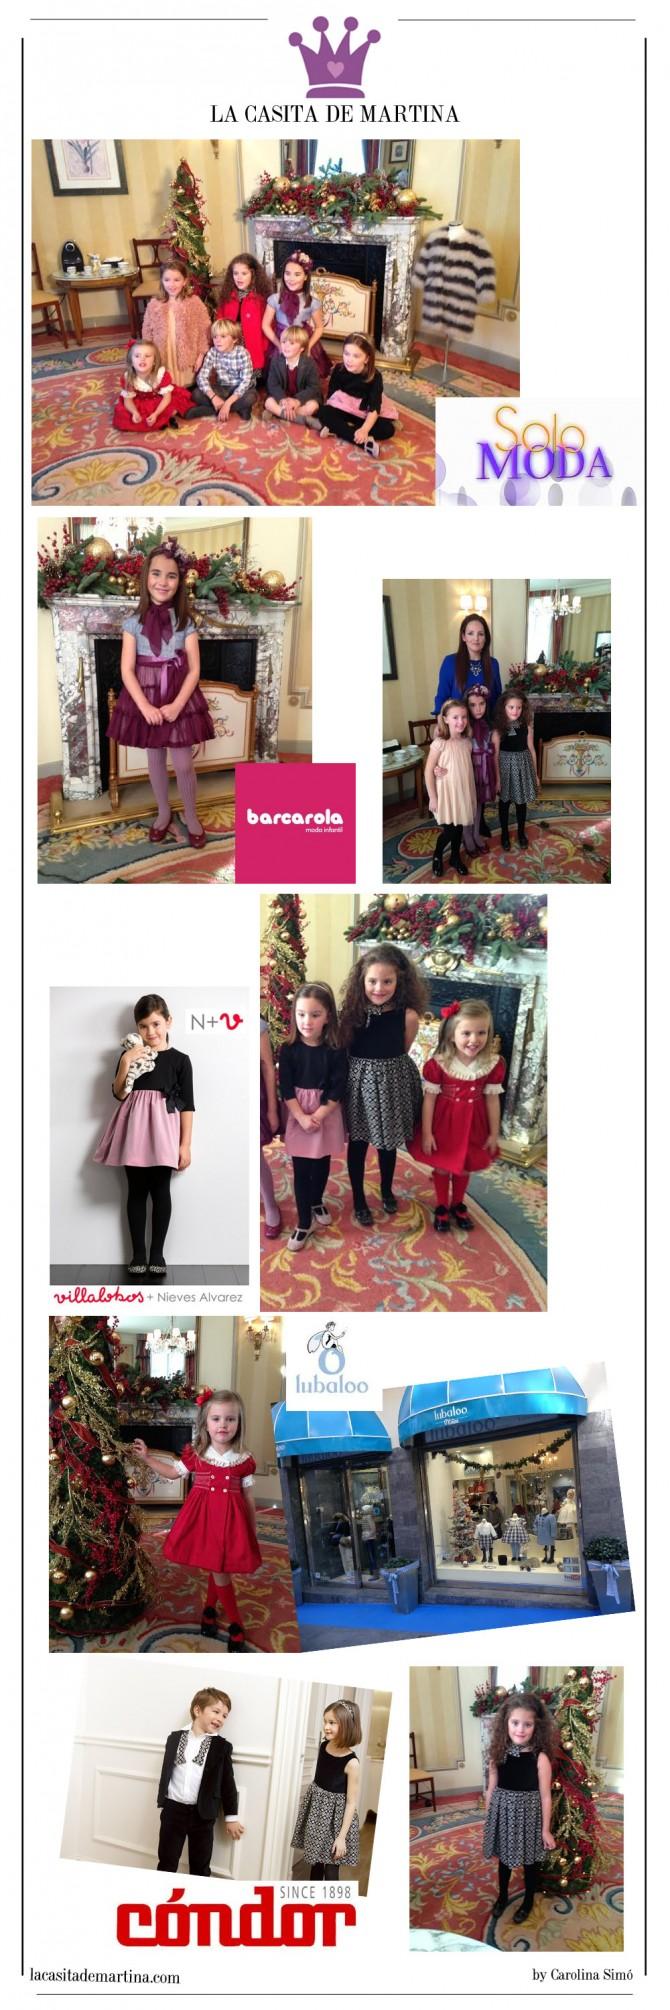 Programa Solo Moda TVE1, Nieves Álvarez, Blog Moda Infantil, Marcas Moda Infantil, Carolina Simó,  La casita de Martina